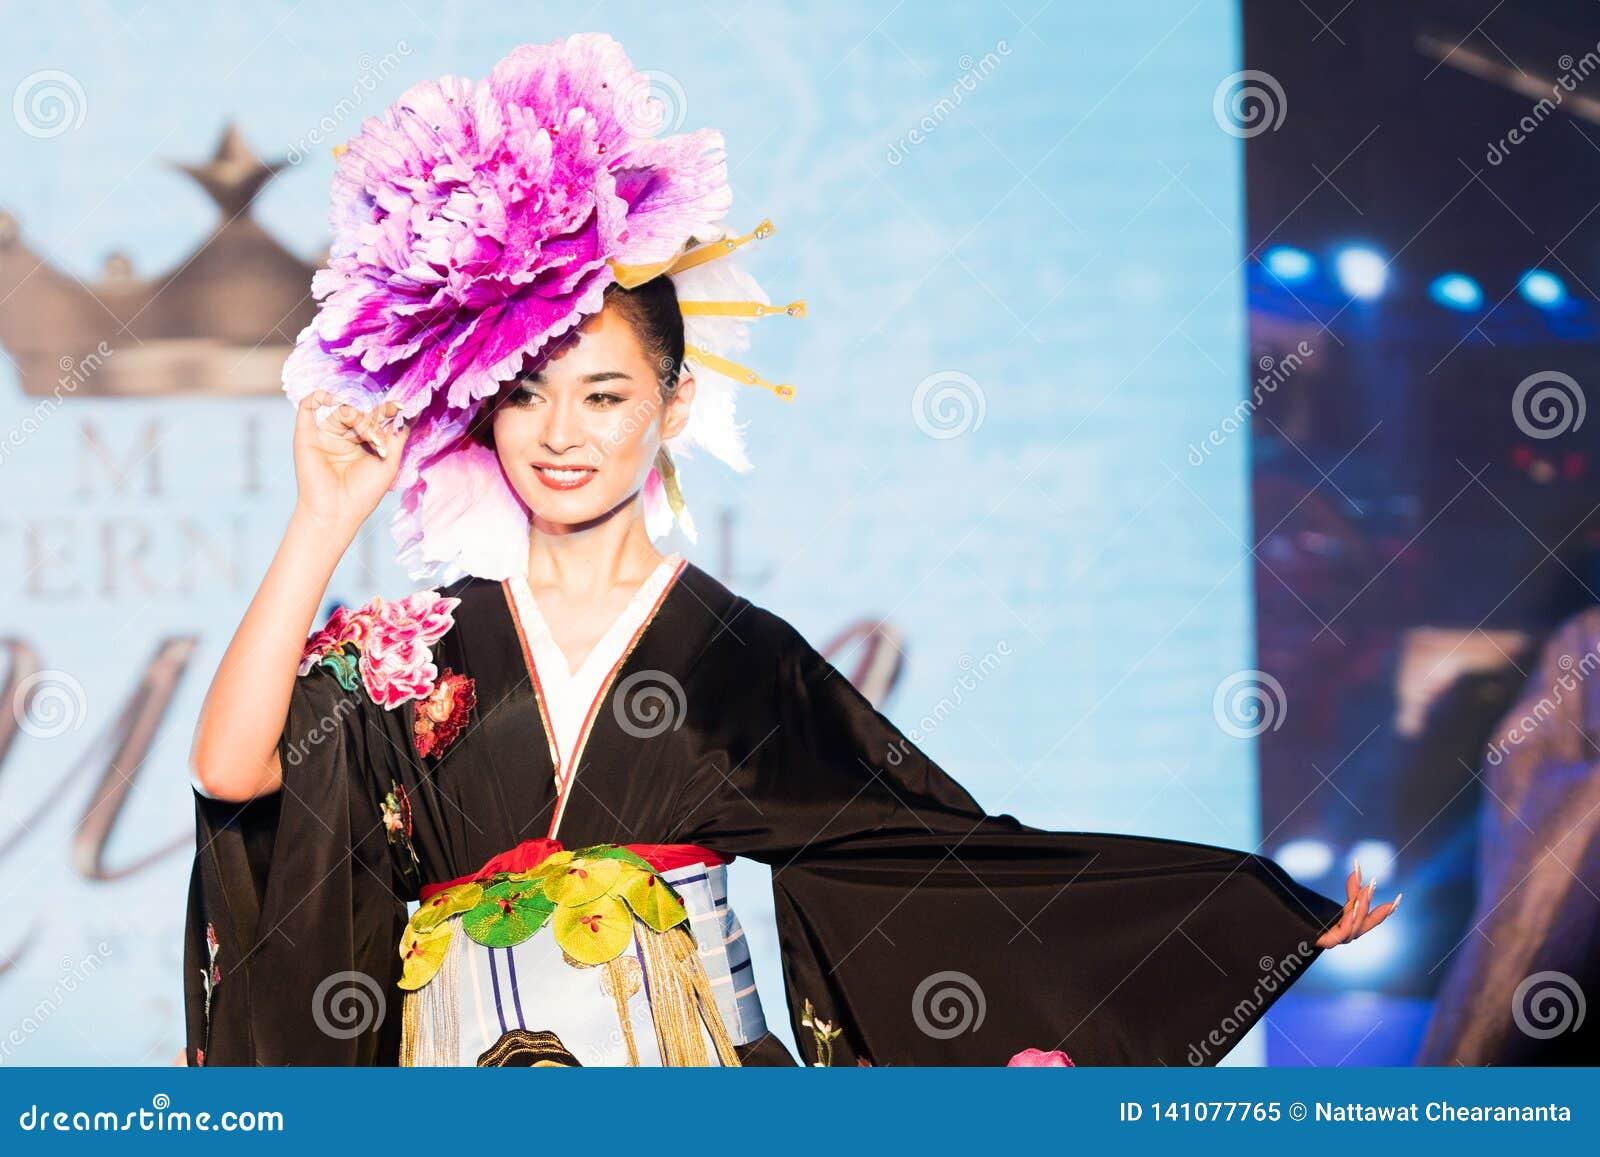 Miss International Queen, Famous Transgender Editorial Image